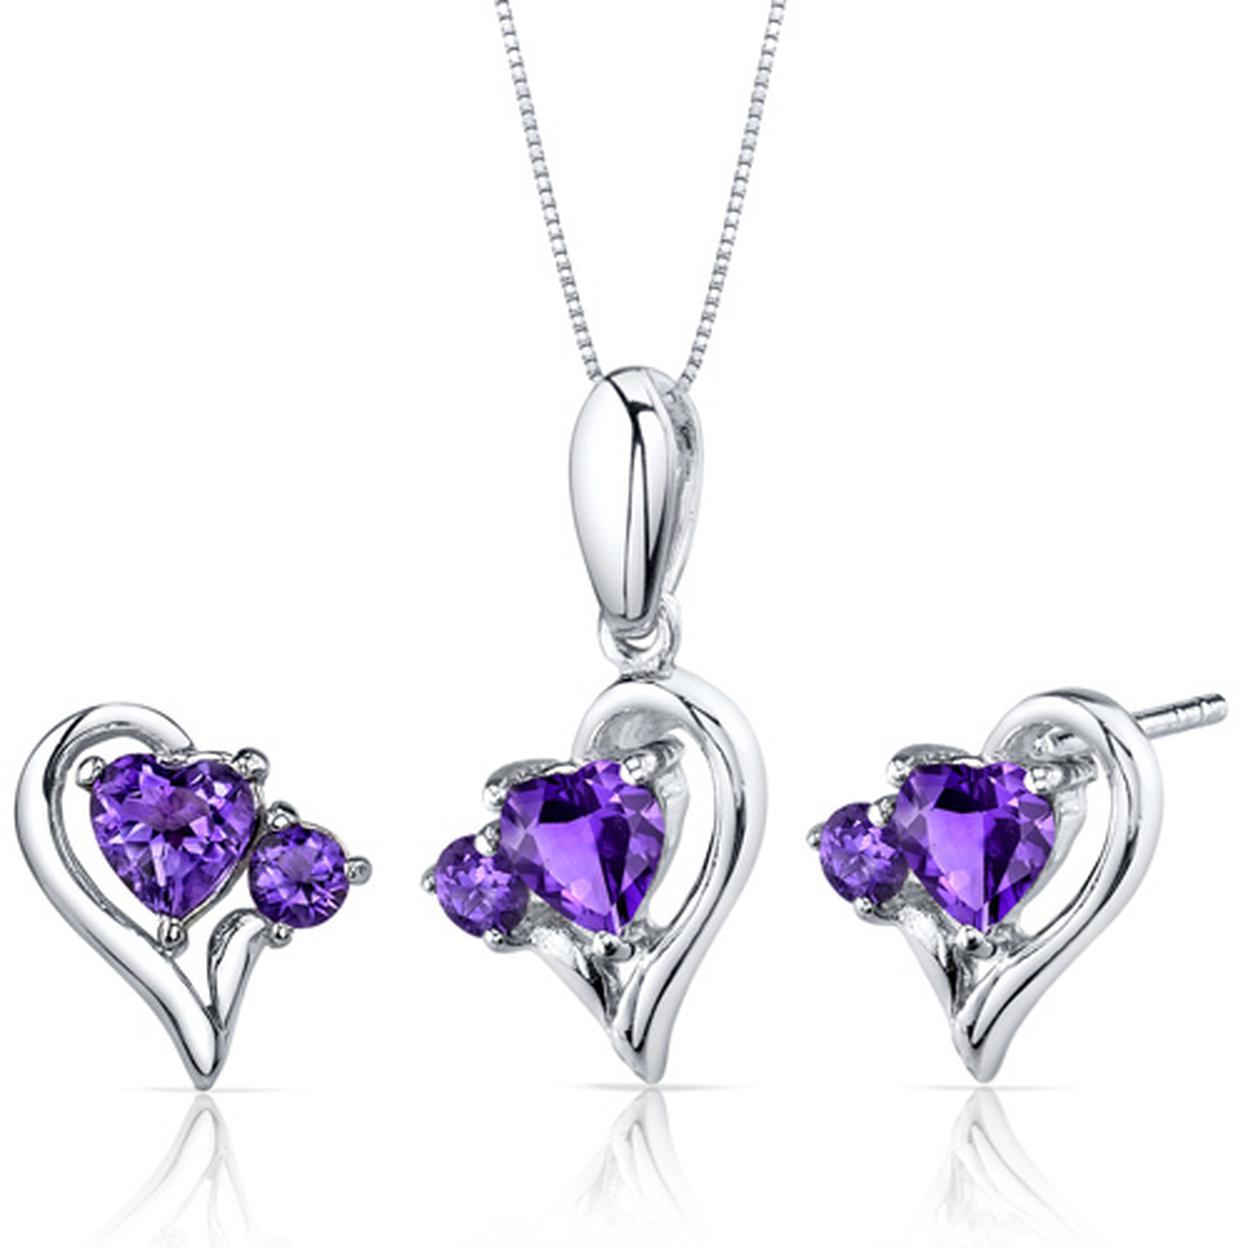 Love And Beauty 2.25 Carats Heart Shape Sterling Silver Amethyst Pendant Earrings Set Style Ss3768